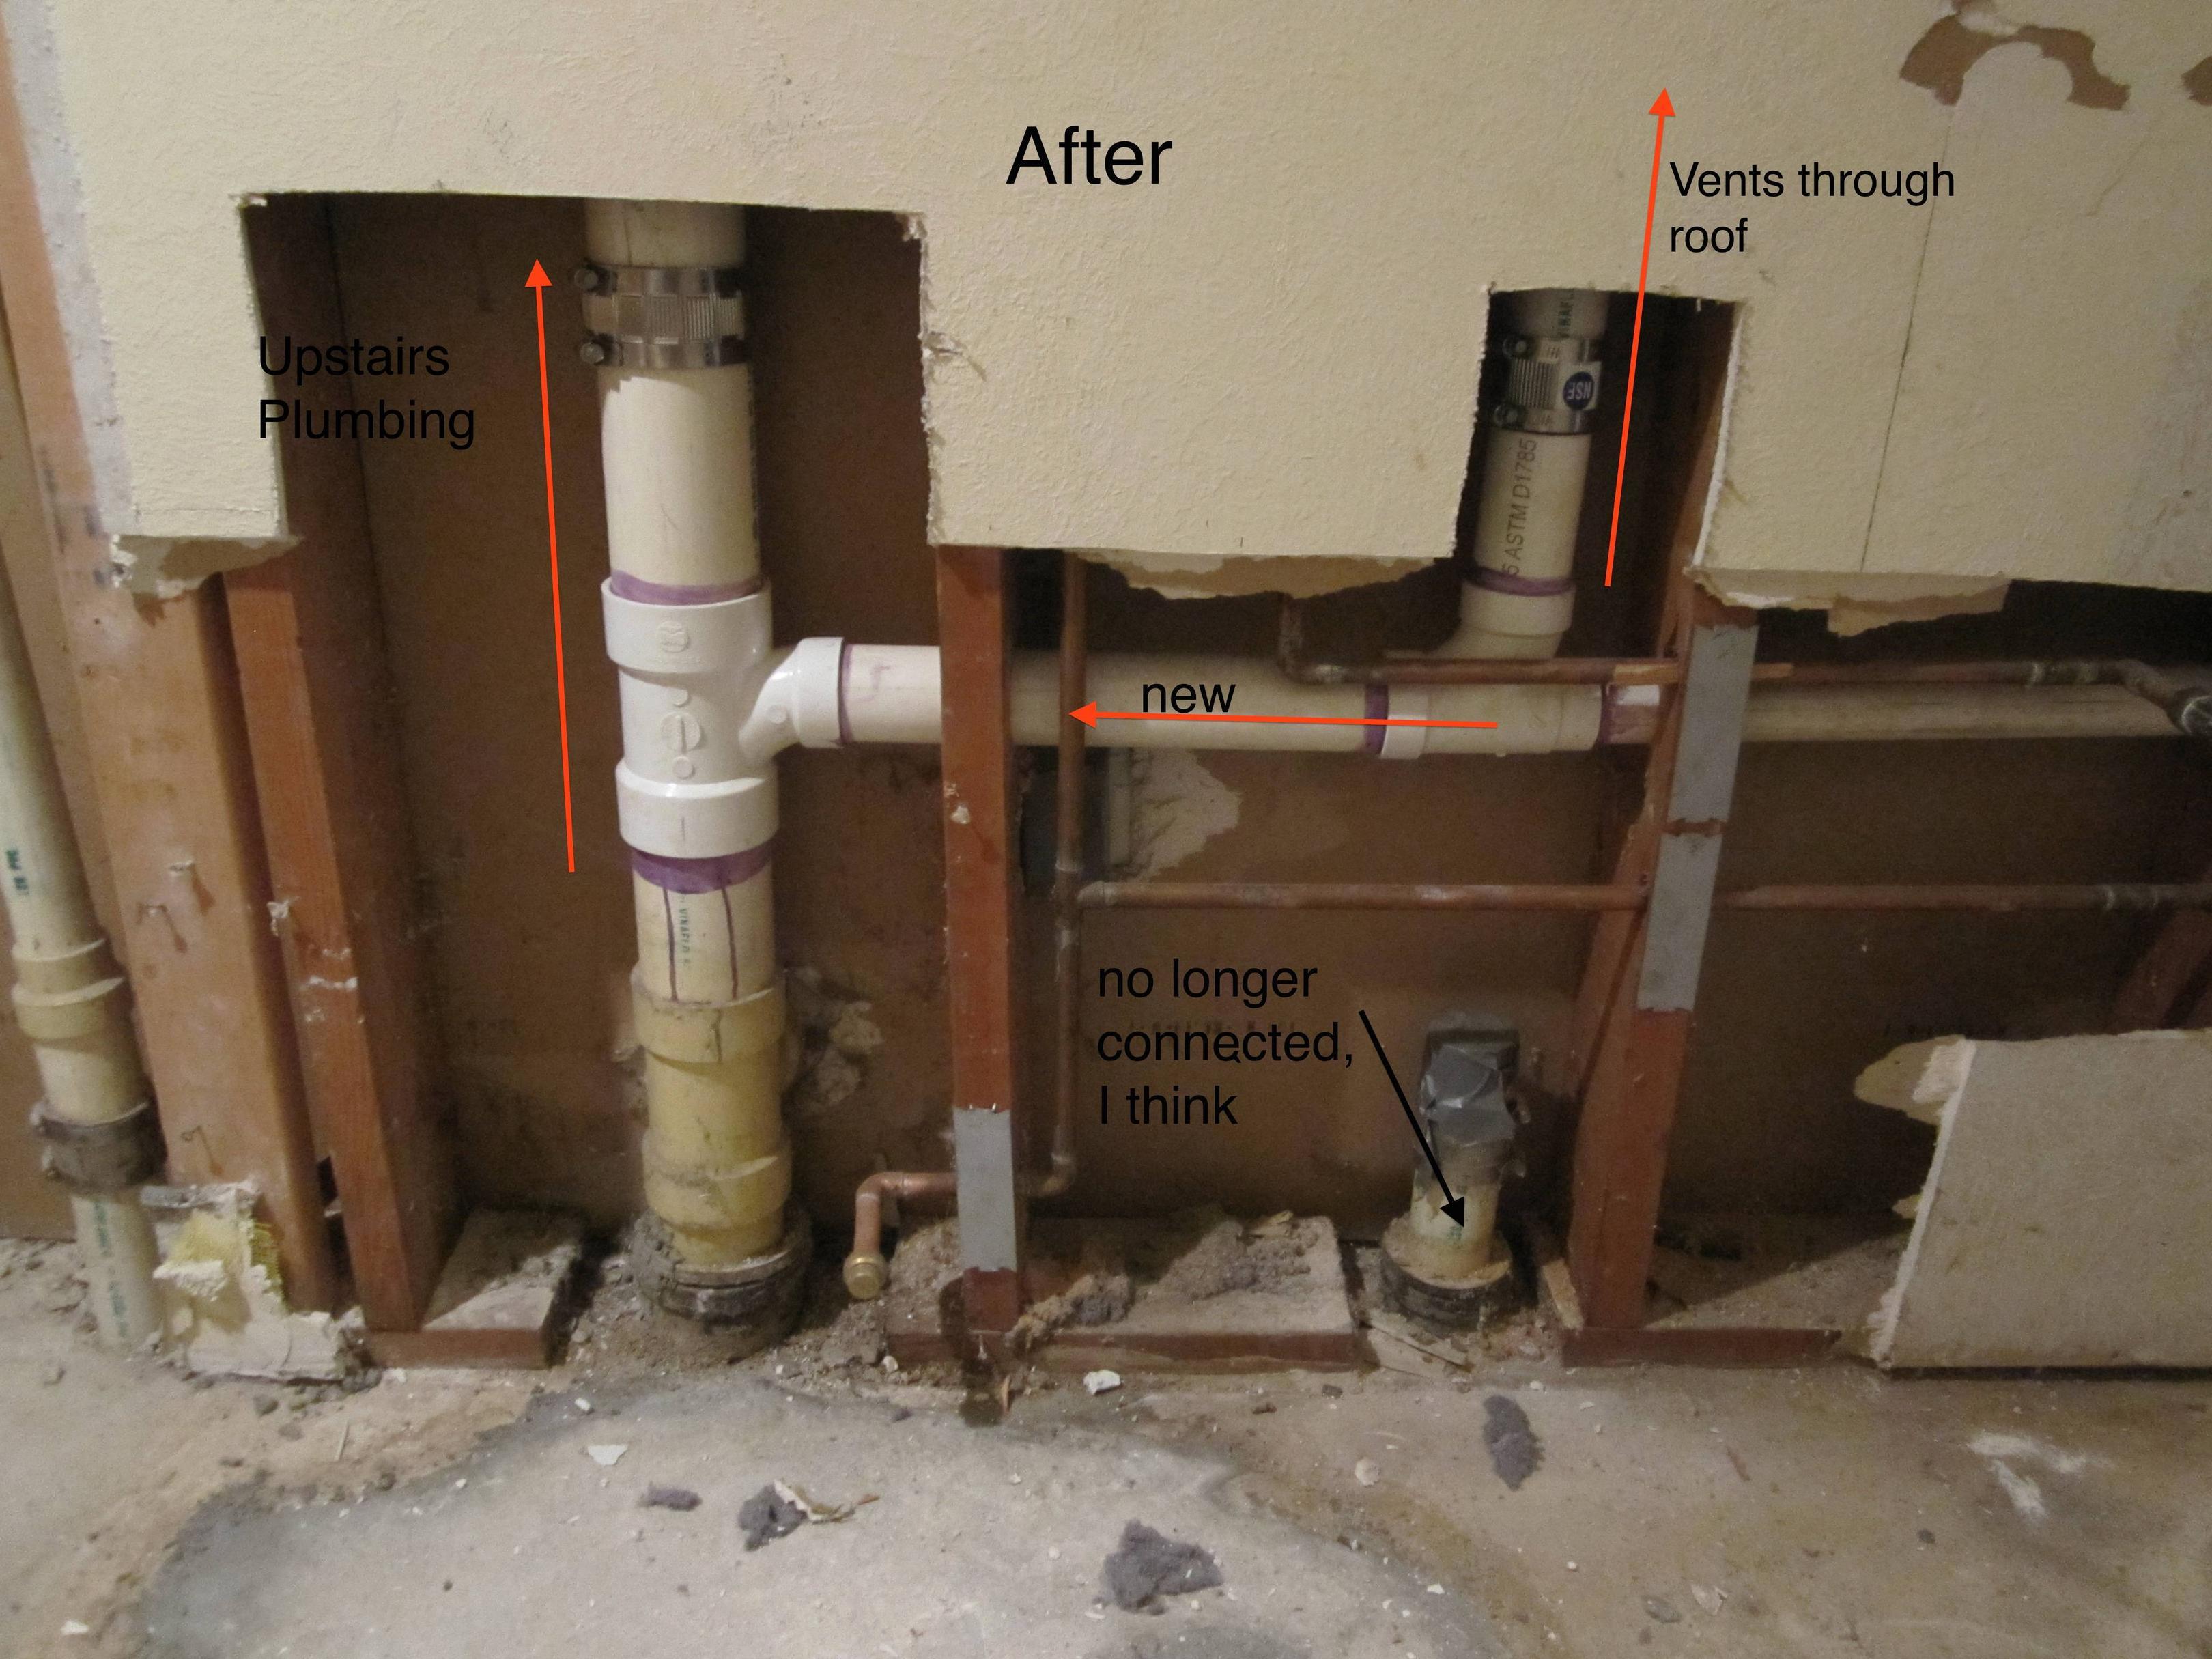 Plumbing Alteration Has Created Vacuum In Upstairs Toilets regarding size 3240 X 2430